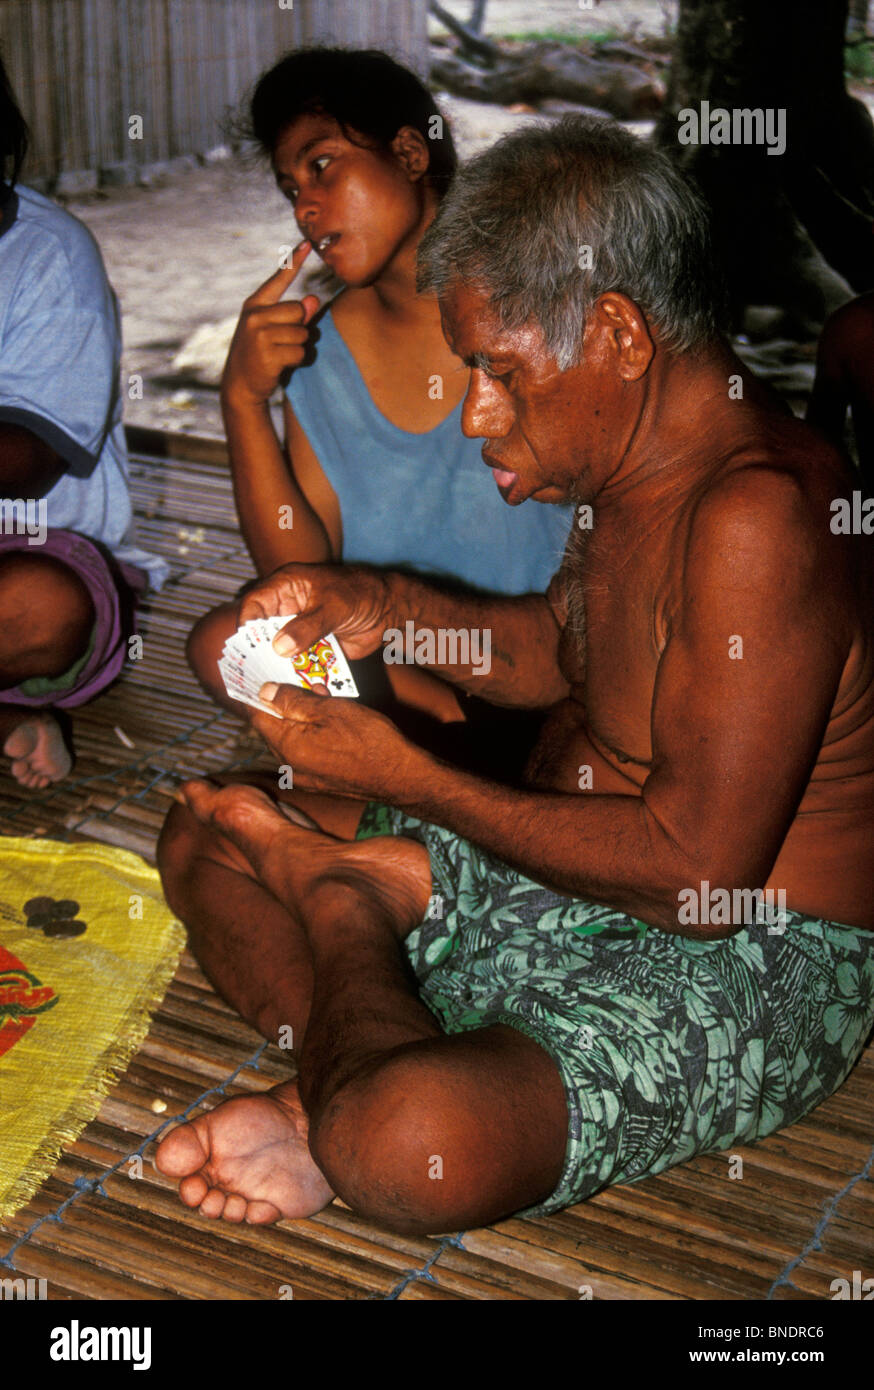 Evening card game at a remote village on Tarawa, Kiribati, Central Pacific - Stock Image